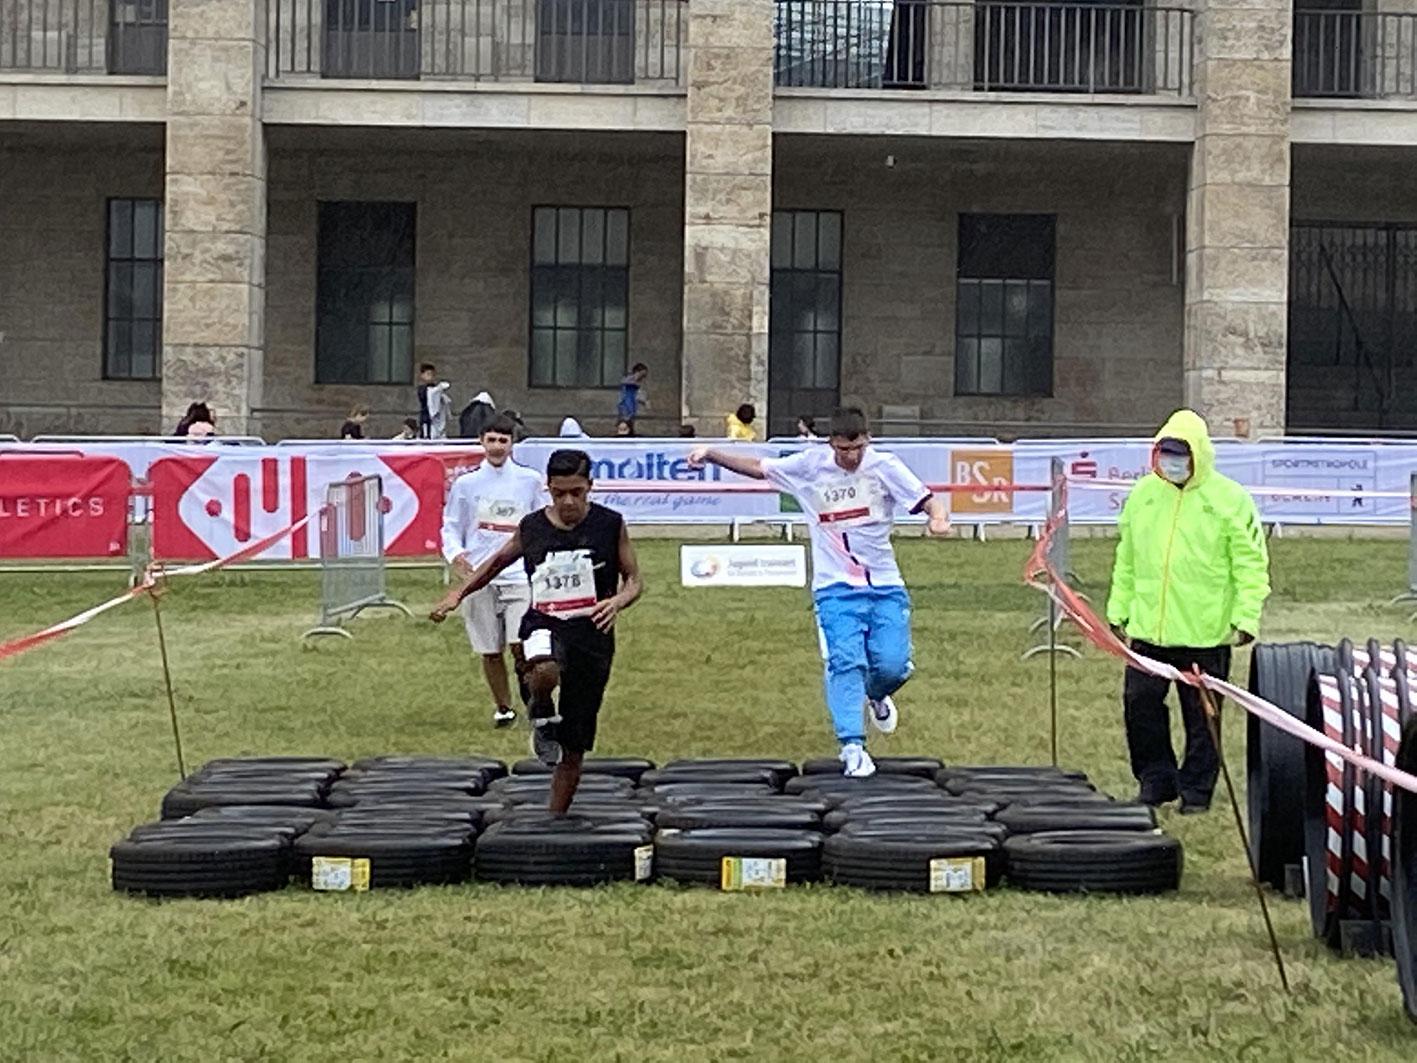 Jugend trainiert für Olympia Huerdensprung - Albrecht Haushofer Schule